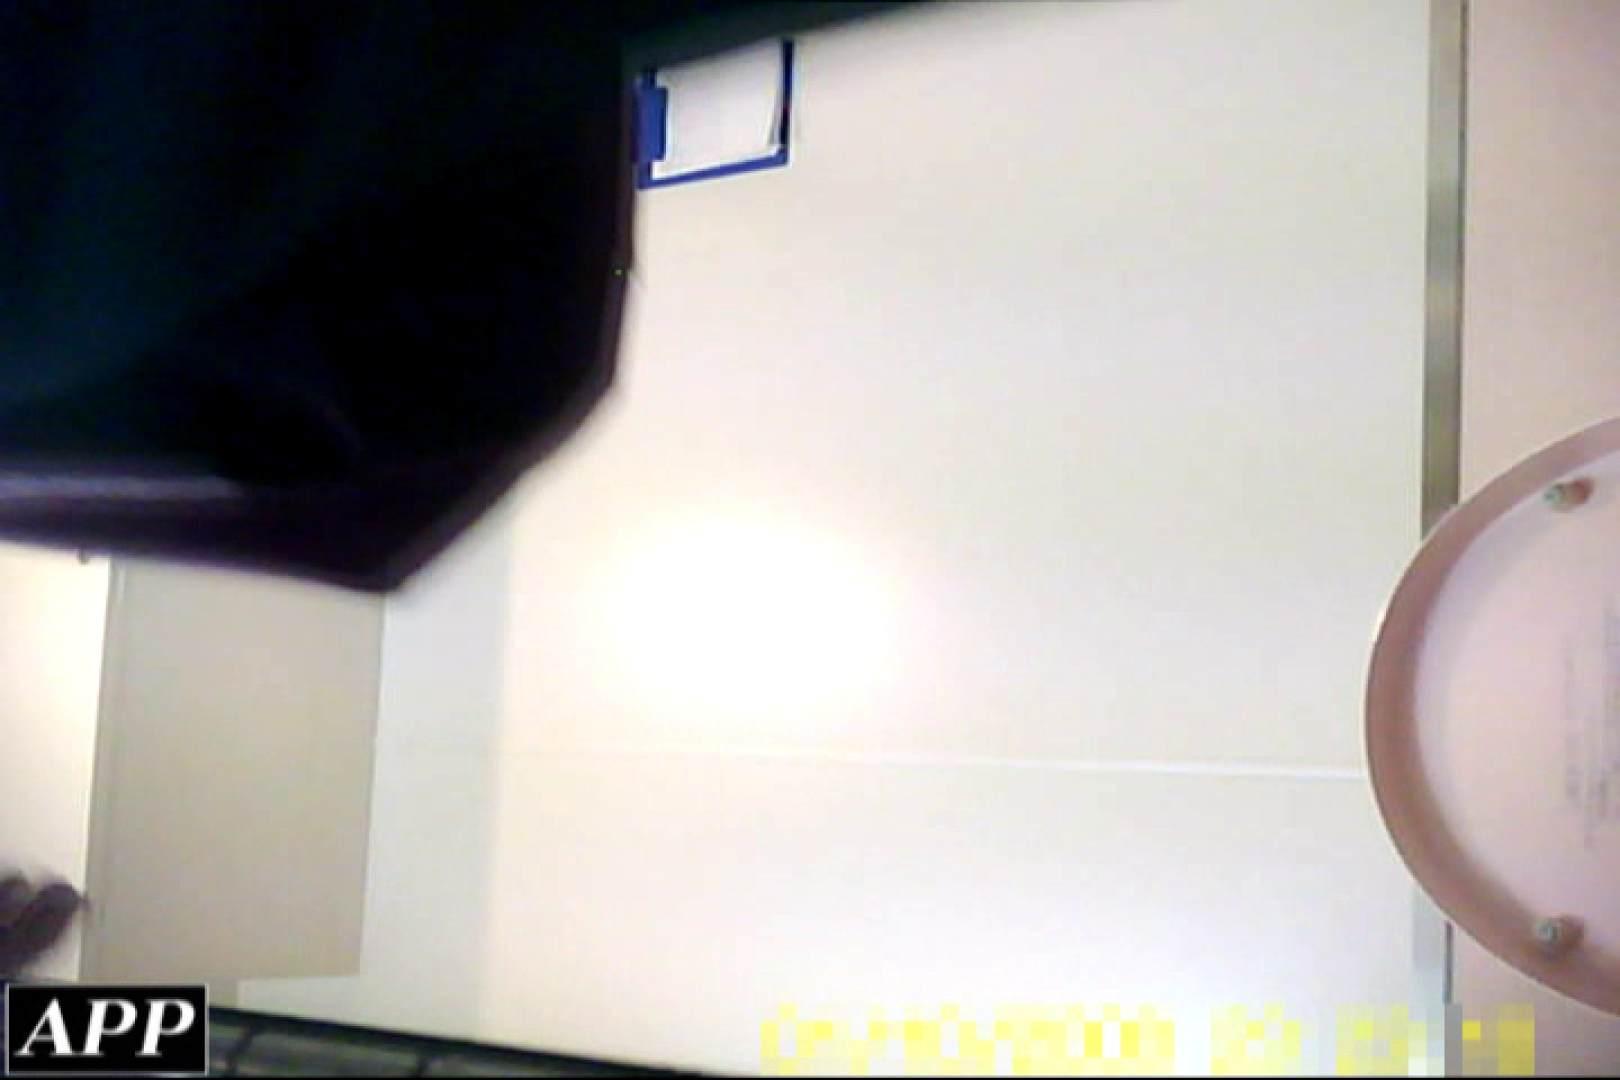 3視点洗面所 vol.127 盗撮シリーズ セックス無修正動画無料 79PIX 27